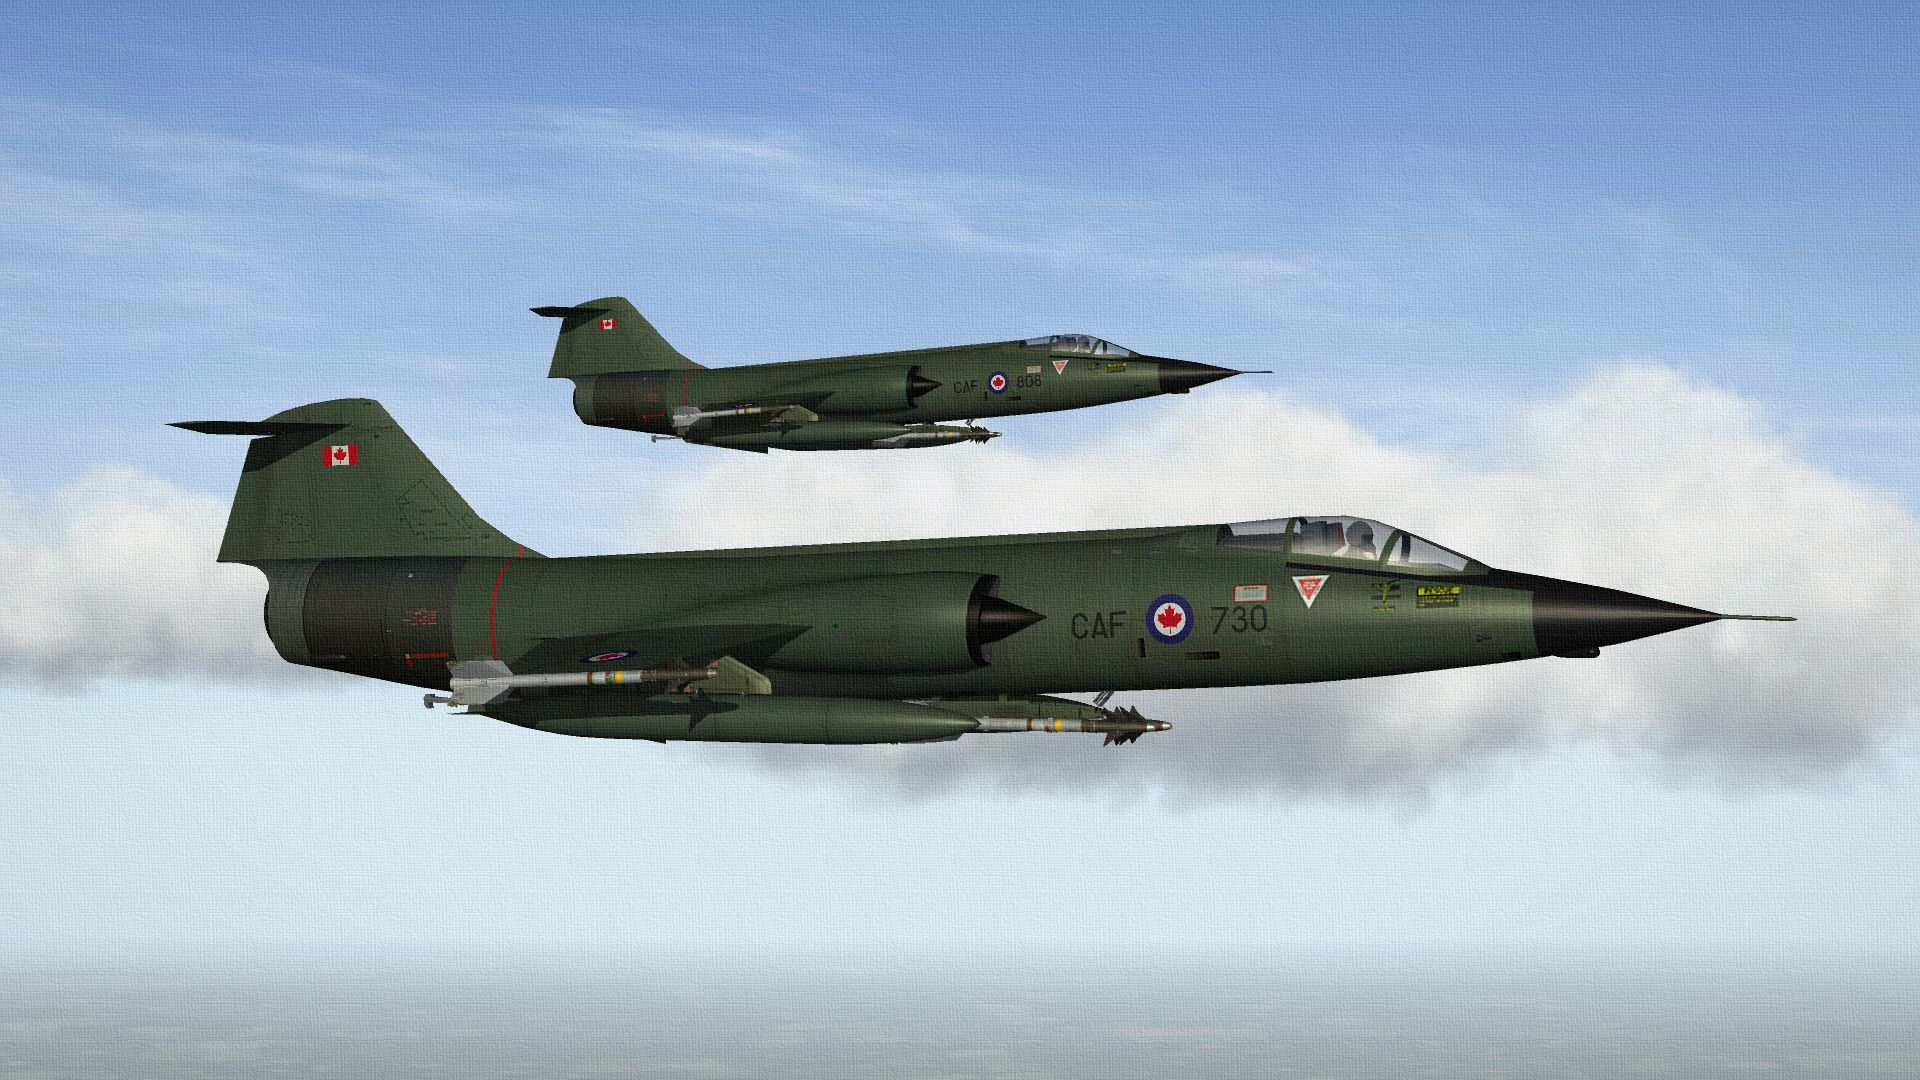 RCAF%20CF-104%20STARFIGHTER.01_zpsmwzgjw